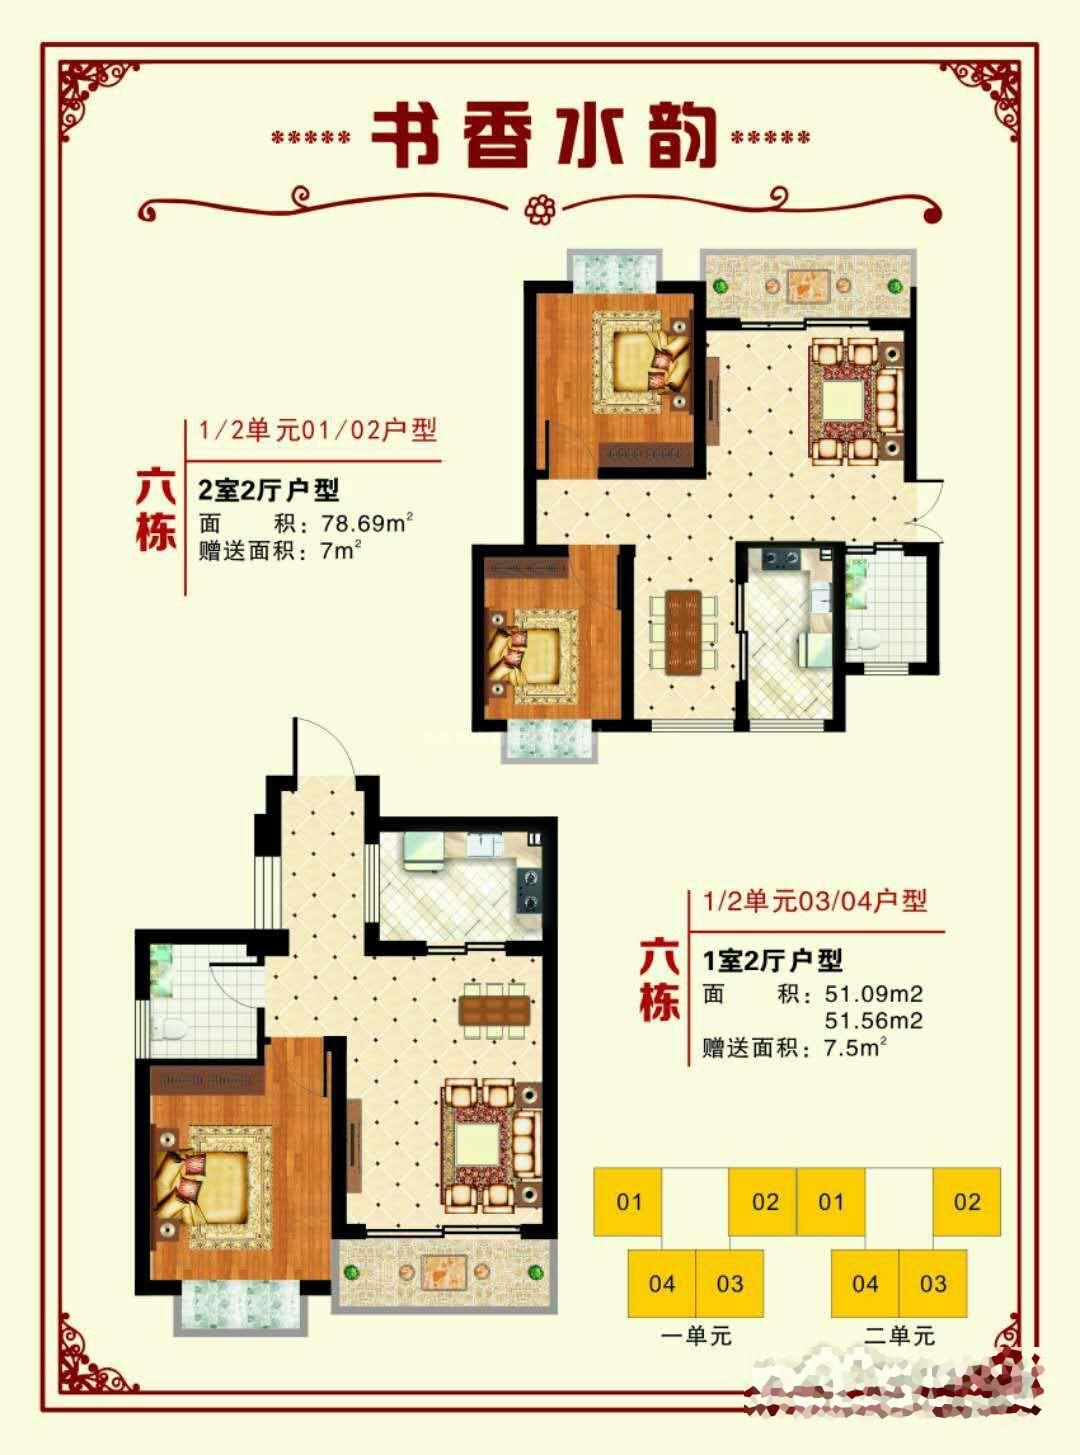 2室2厅 建面78.69平、3室2厅 建面51.09平